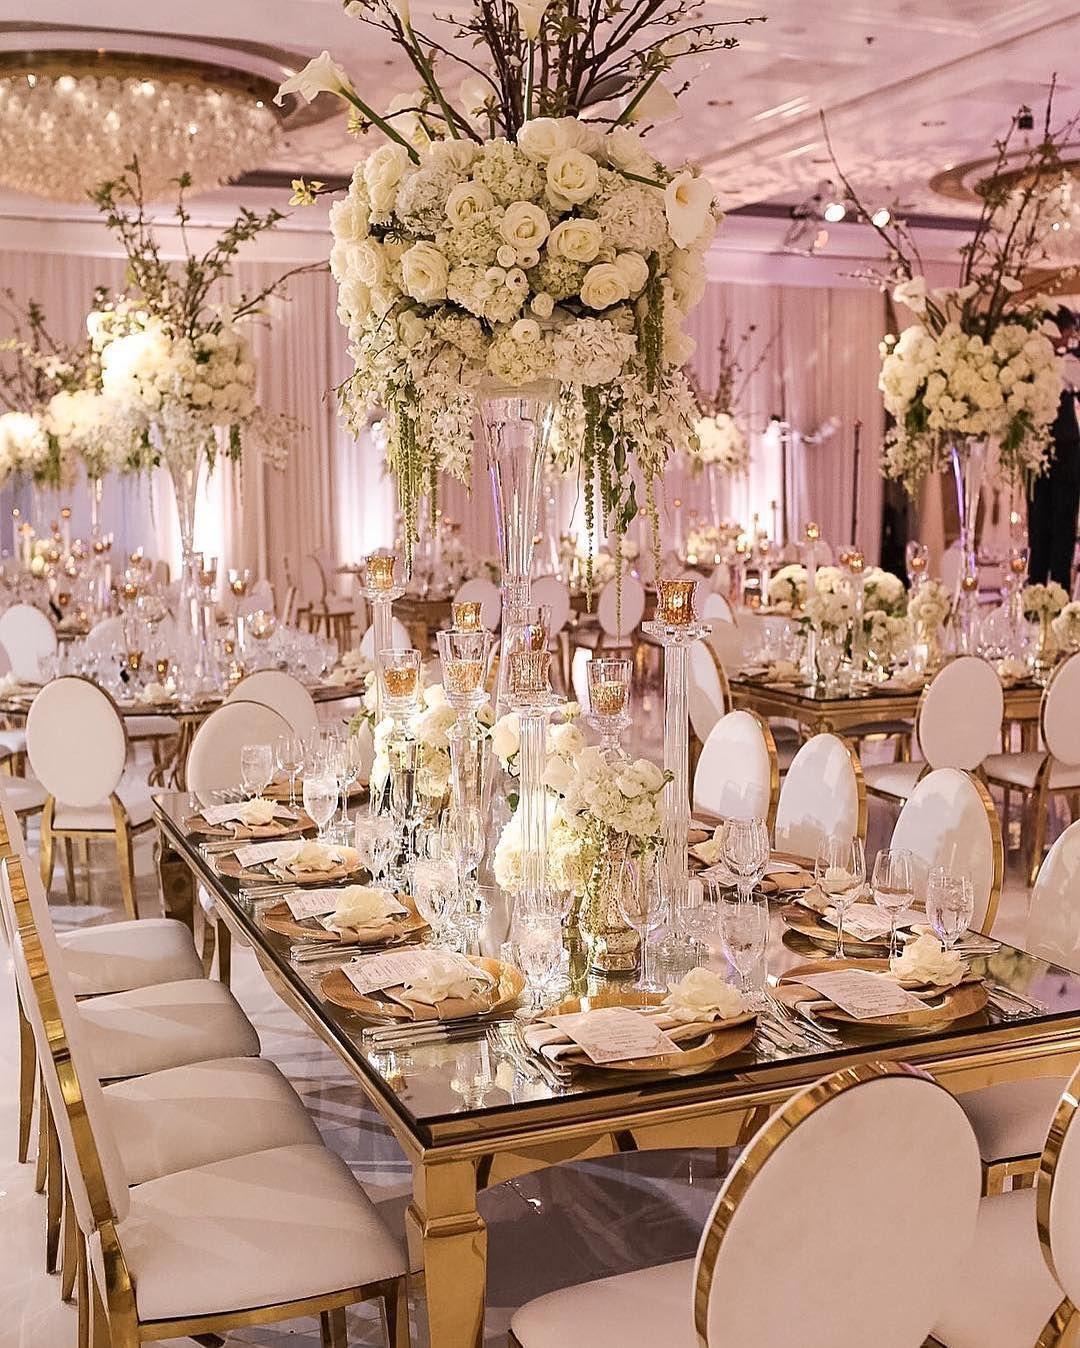 Wedding Venue Decoration Ideas: Follow Us @SIGNATUREBRIDE On Twitter And On FACEBOOK